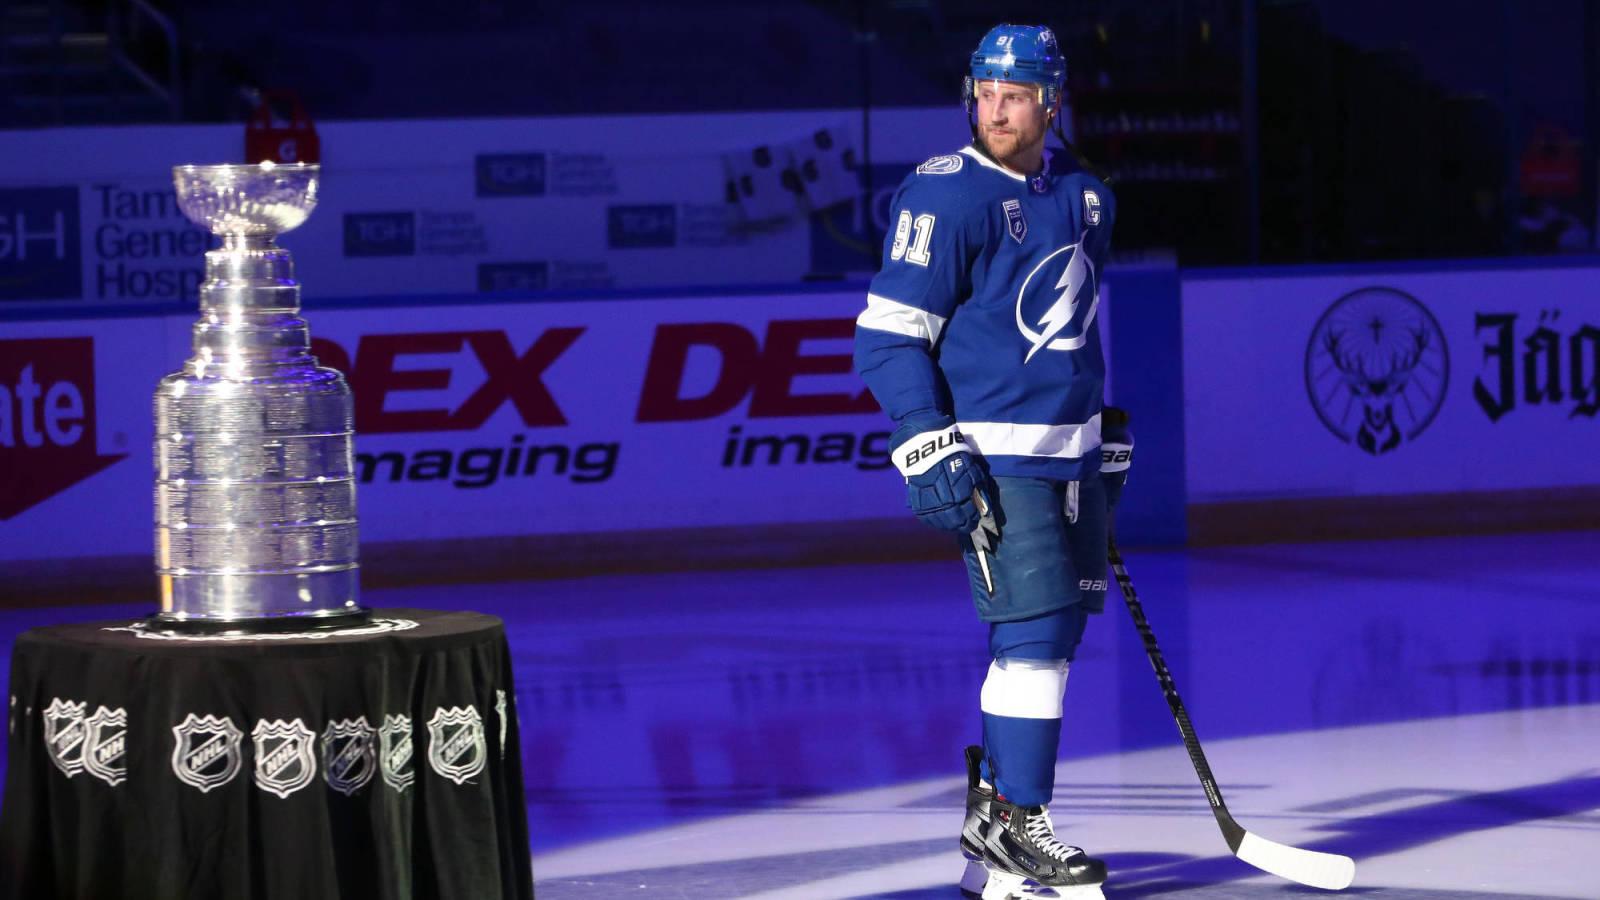 NHL awards preview for 2020-21 NHL season - Yardbarker